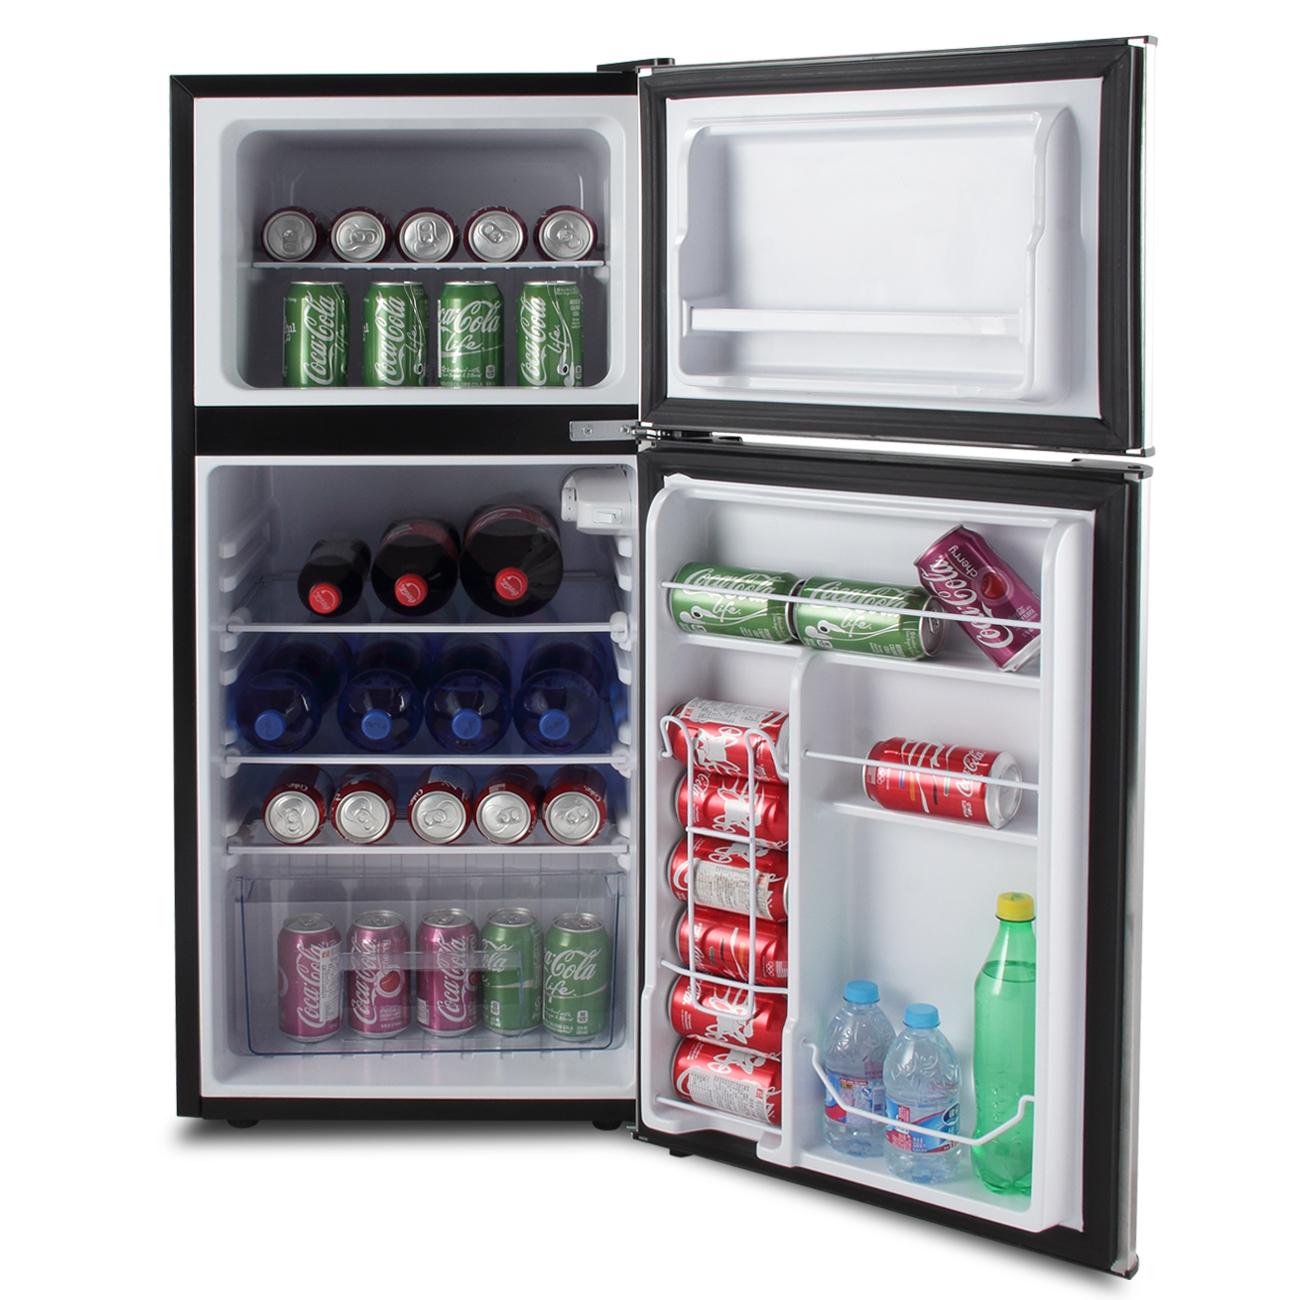 4 5 cu ft mini fridge compact refrigerator freezer dorm. Black Bedroom Furniture Sets. Home Design Ideas